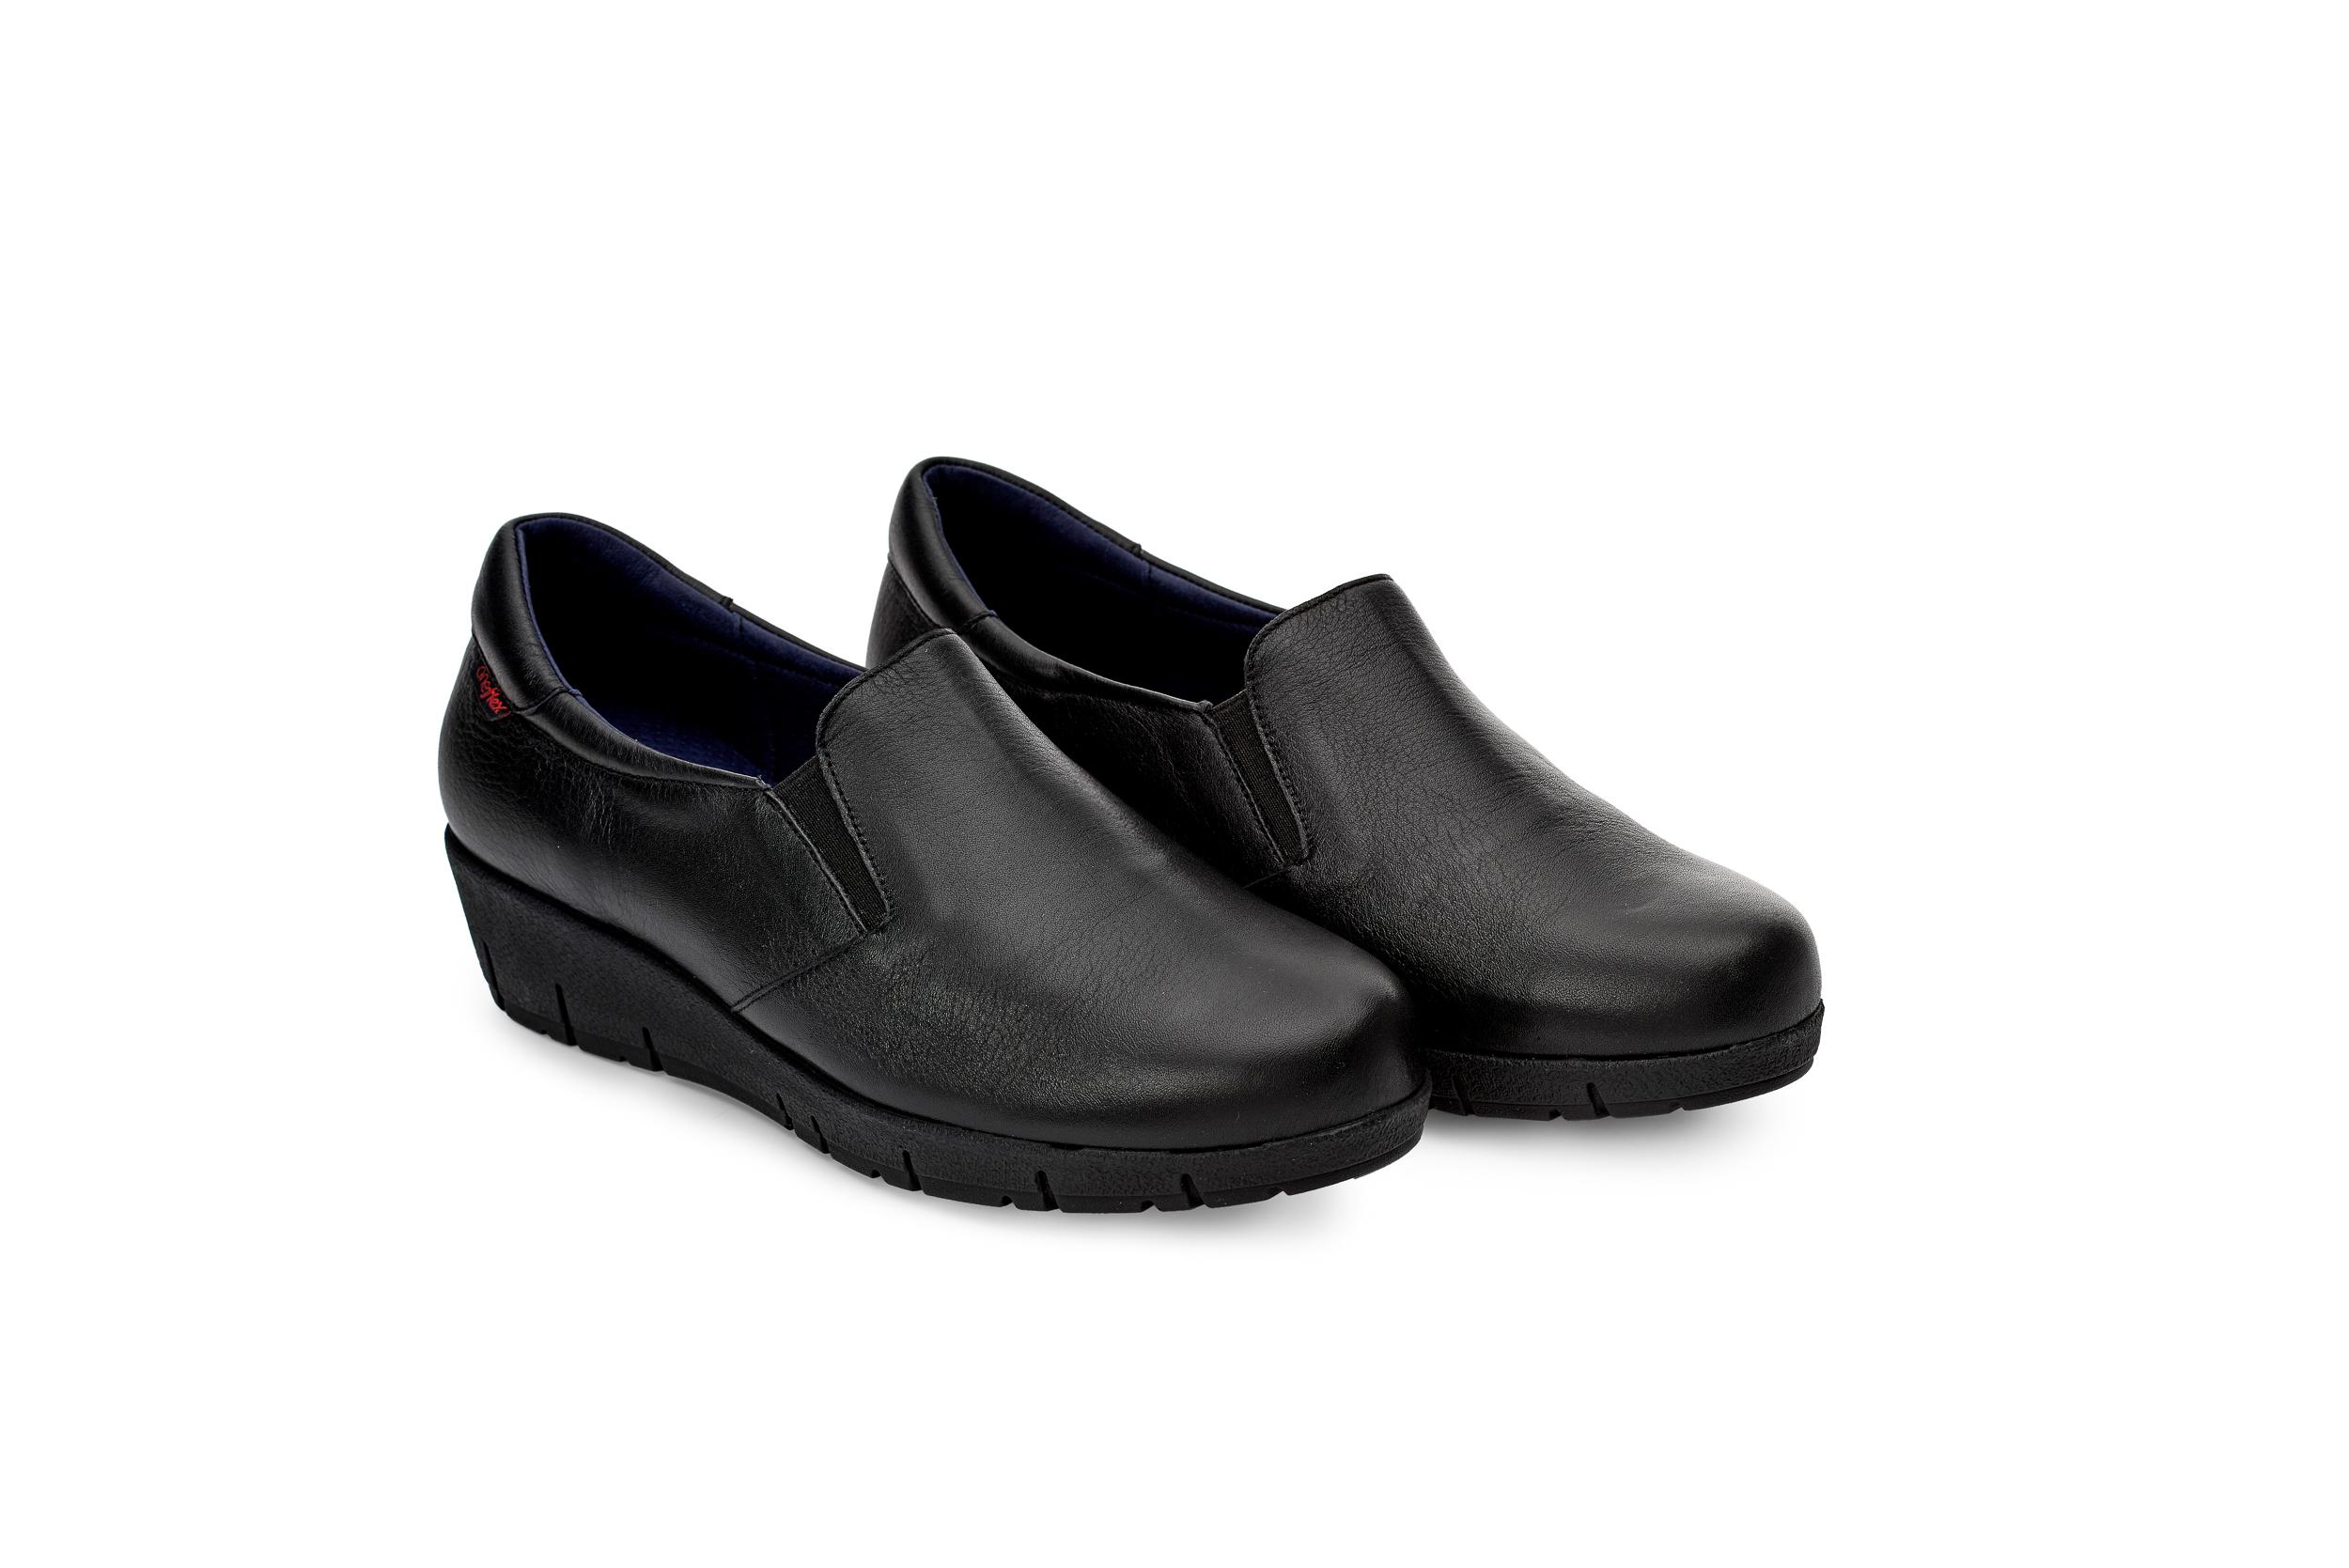 Oneflex the professional comfort colecci n de oneflex calzado anat mico para sanidad - Zapatos camarera antideslizantes ...